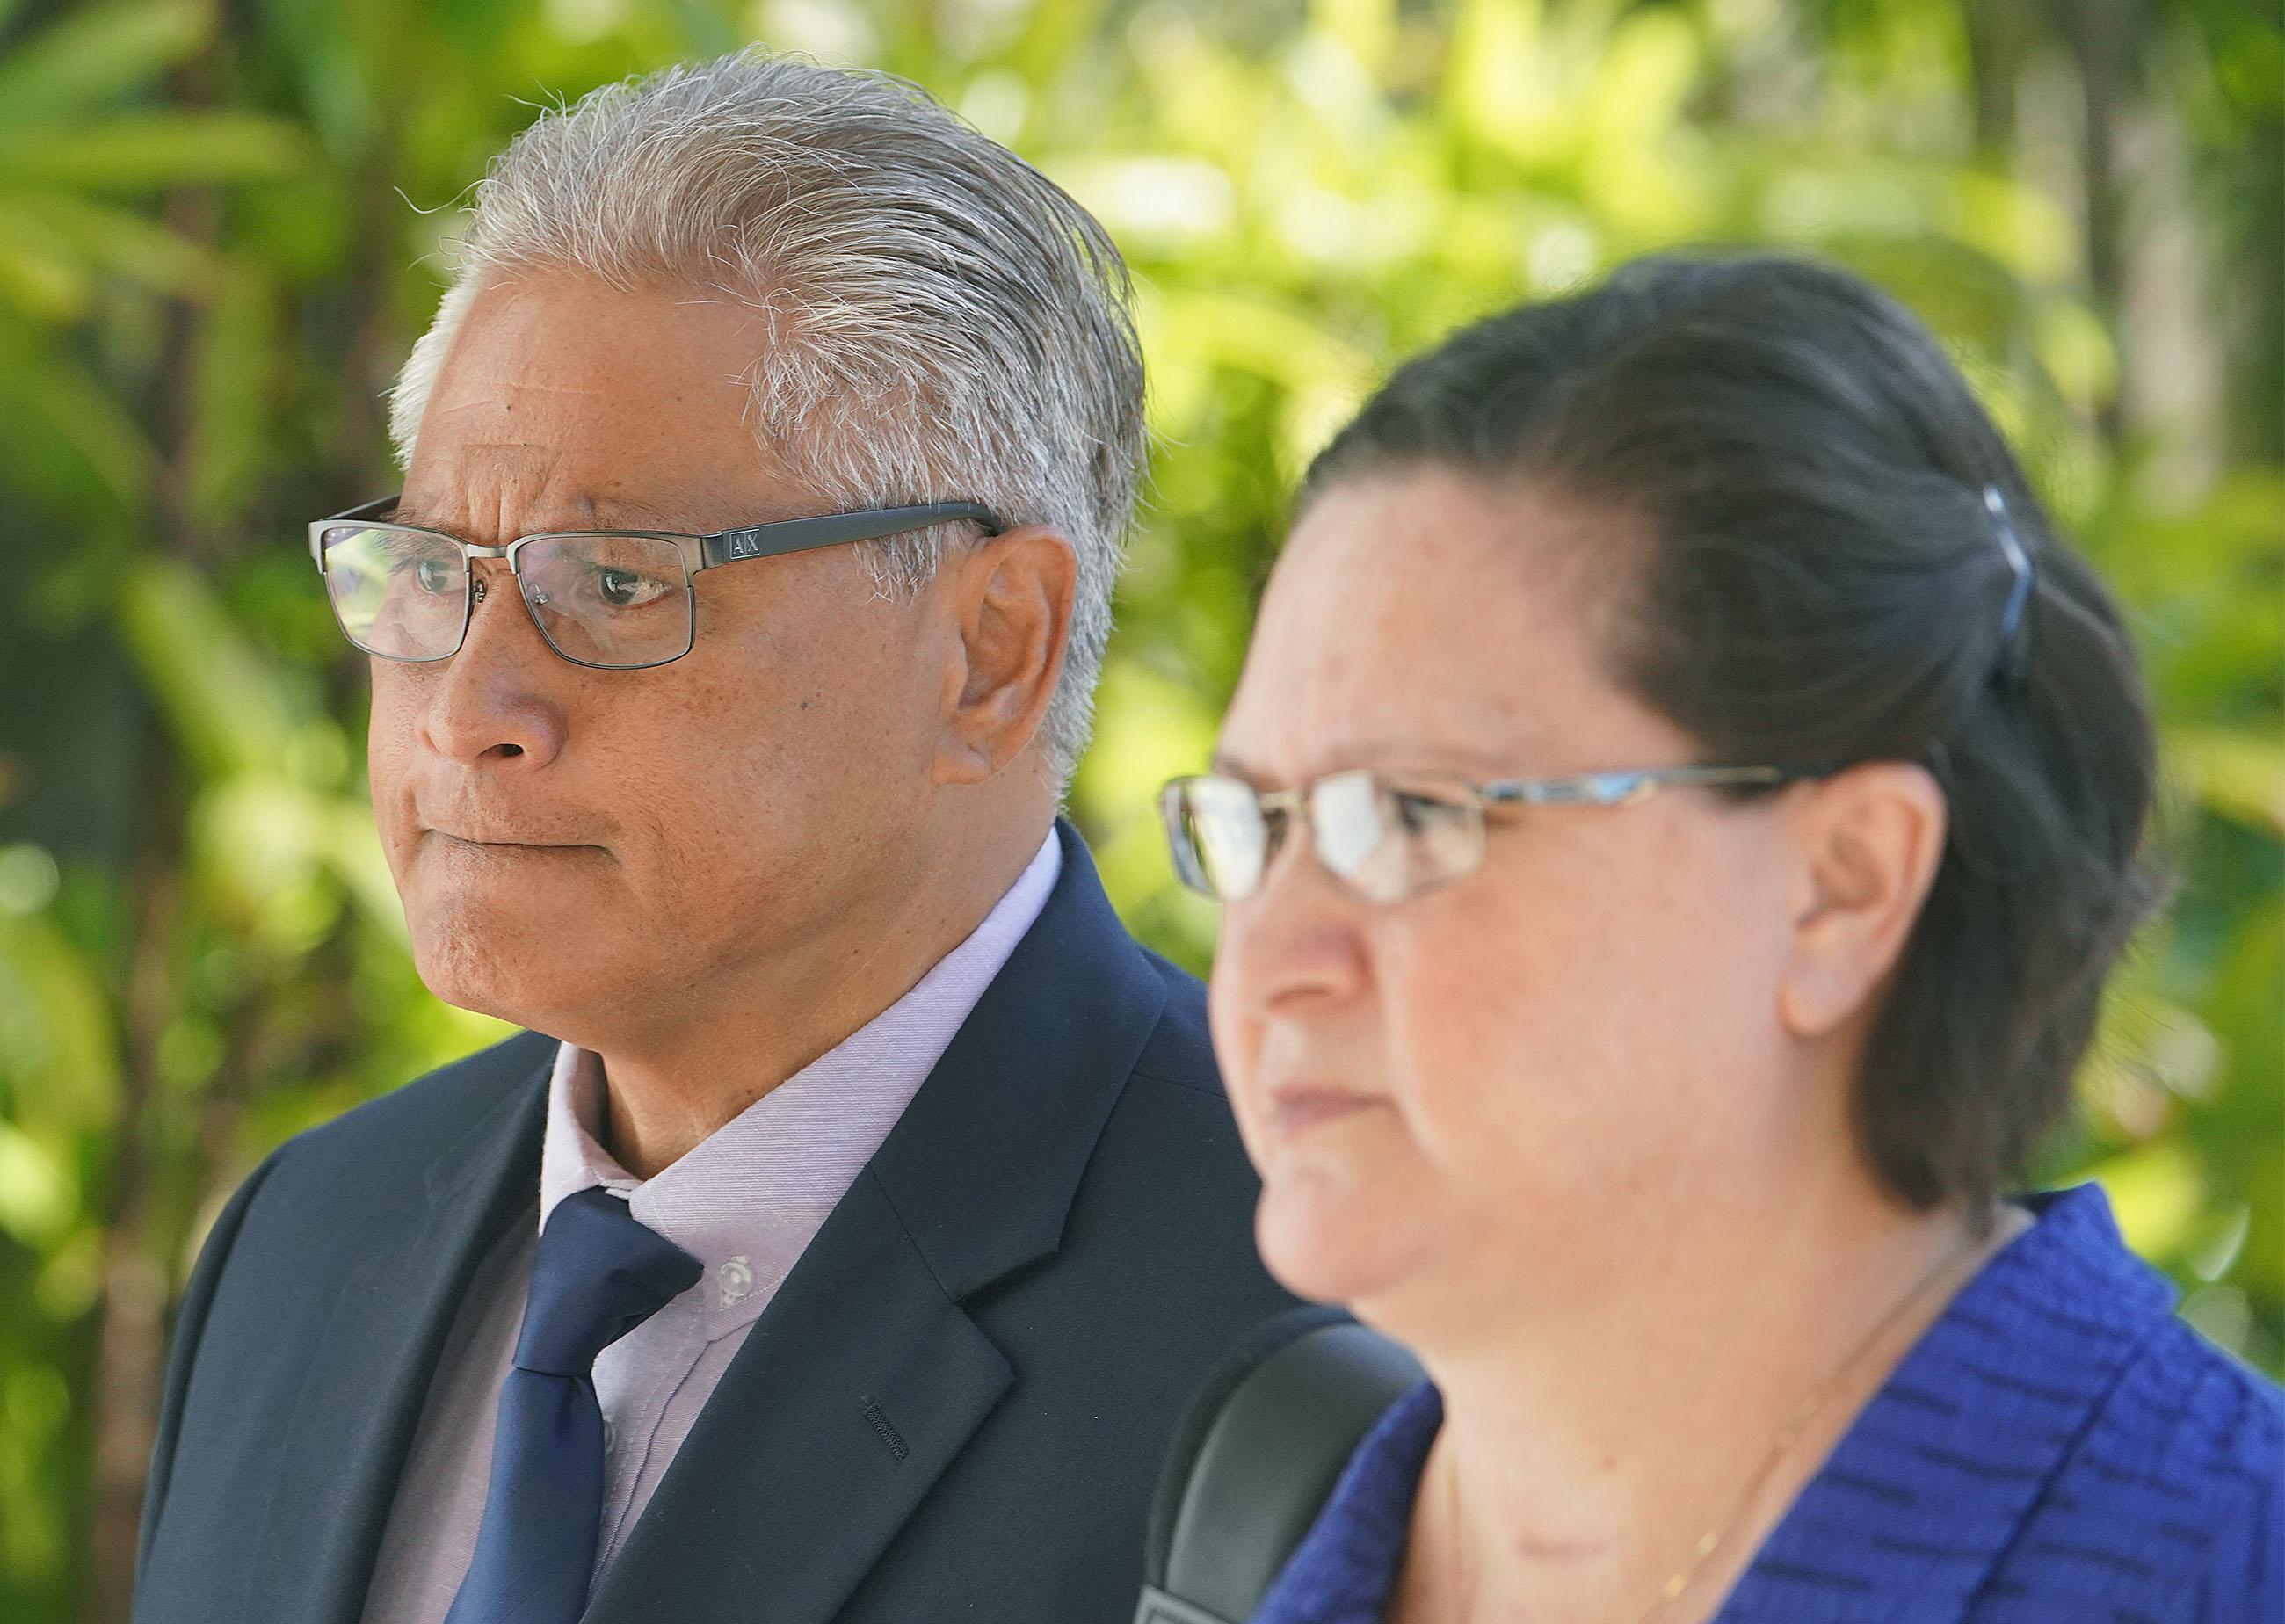 Former HPD Chief Louis Kealoha and Katherine Kealoha arrive at District Court. May 28, 2019